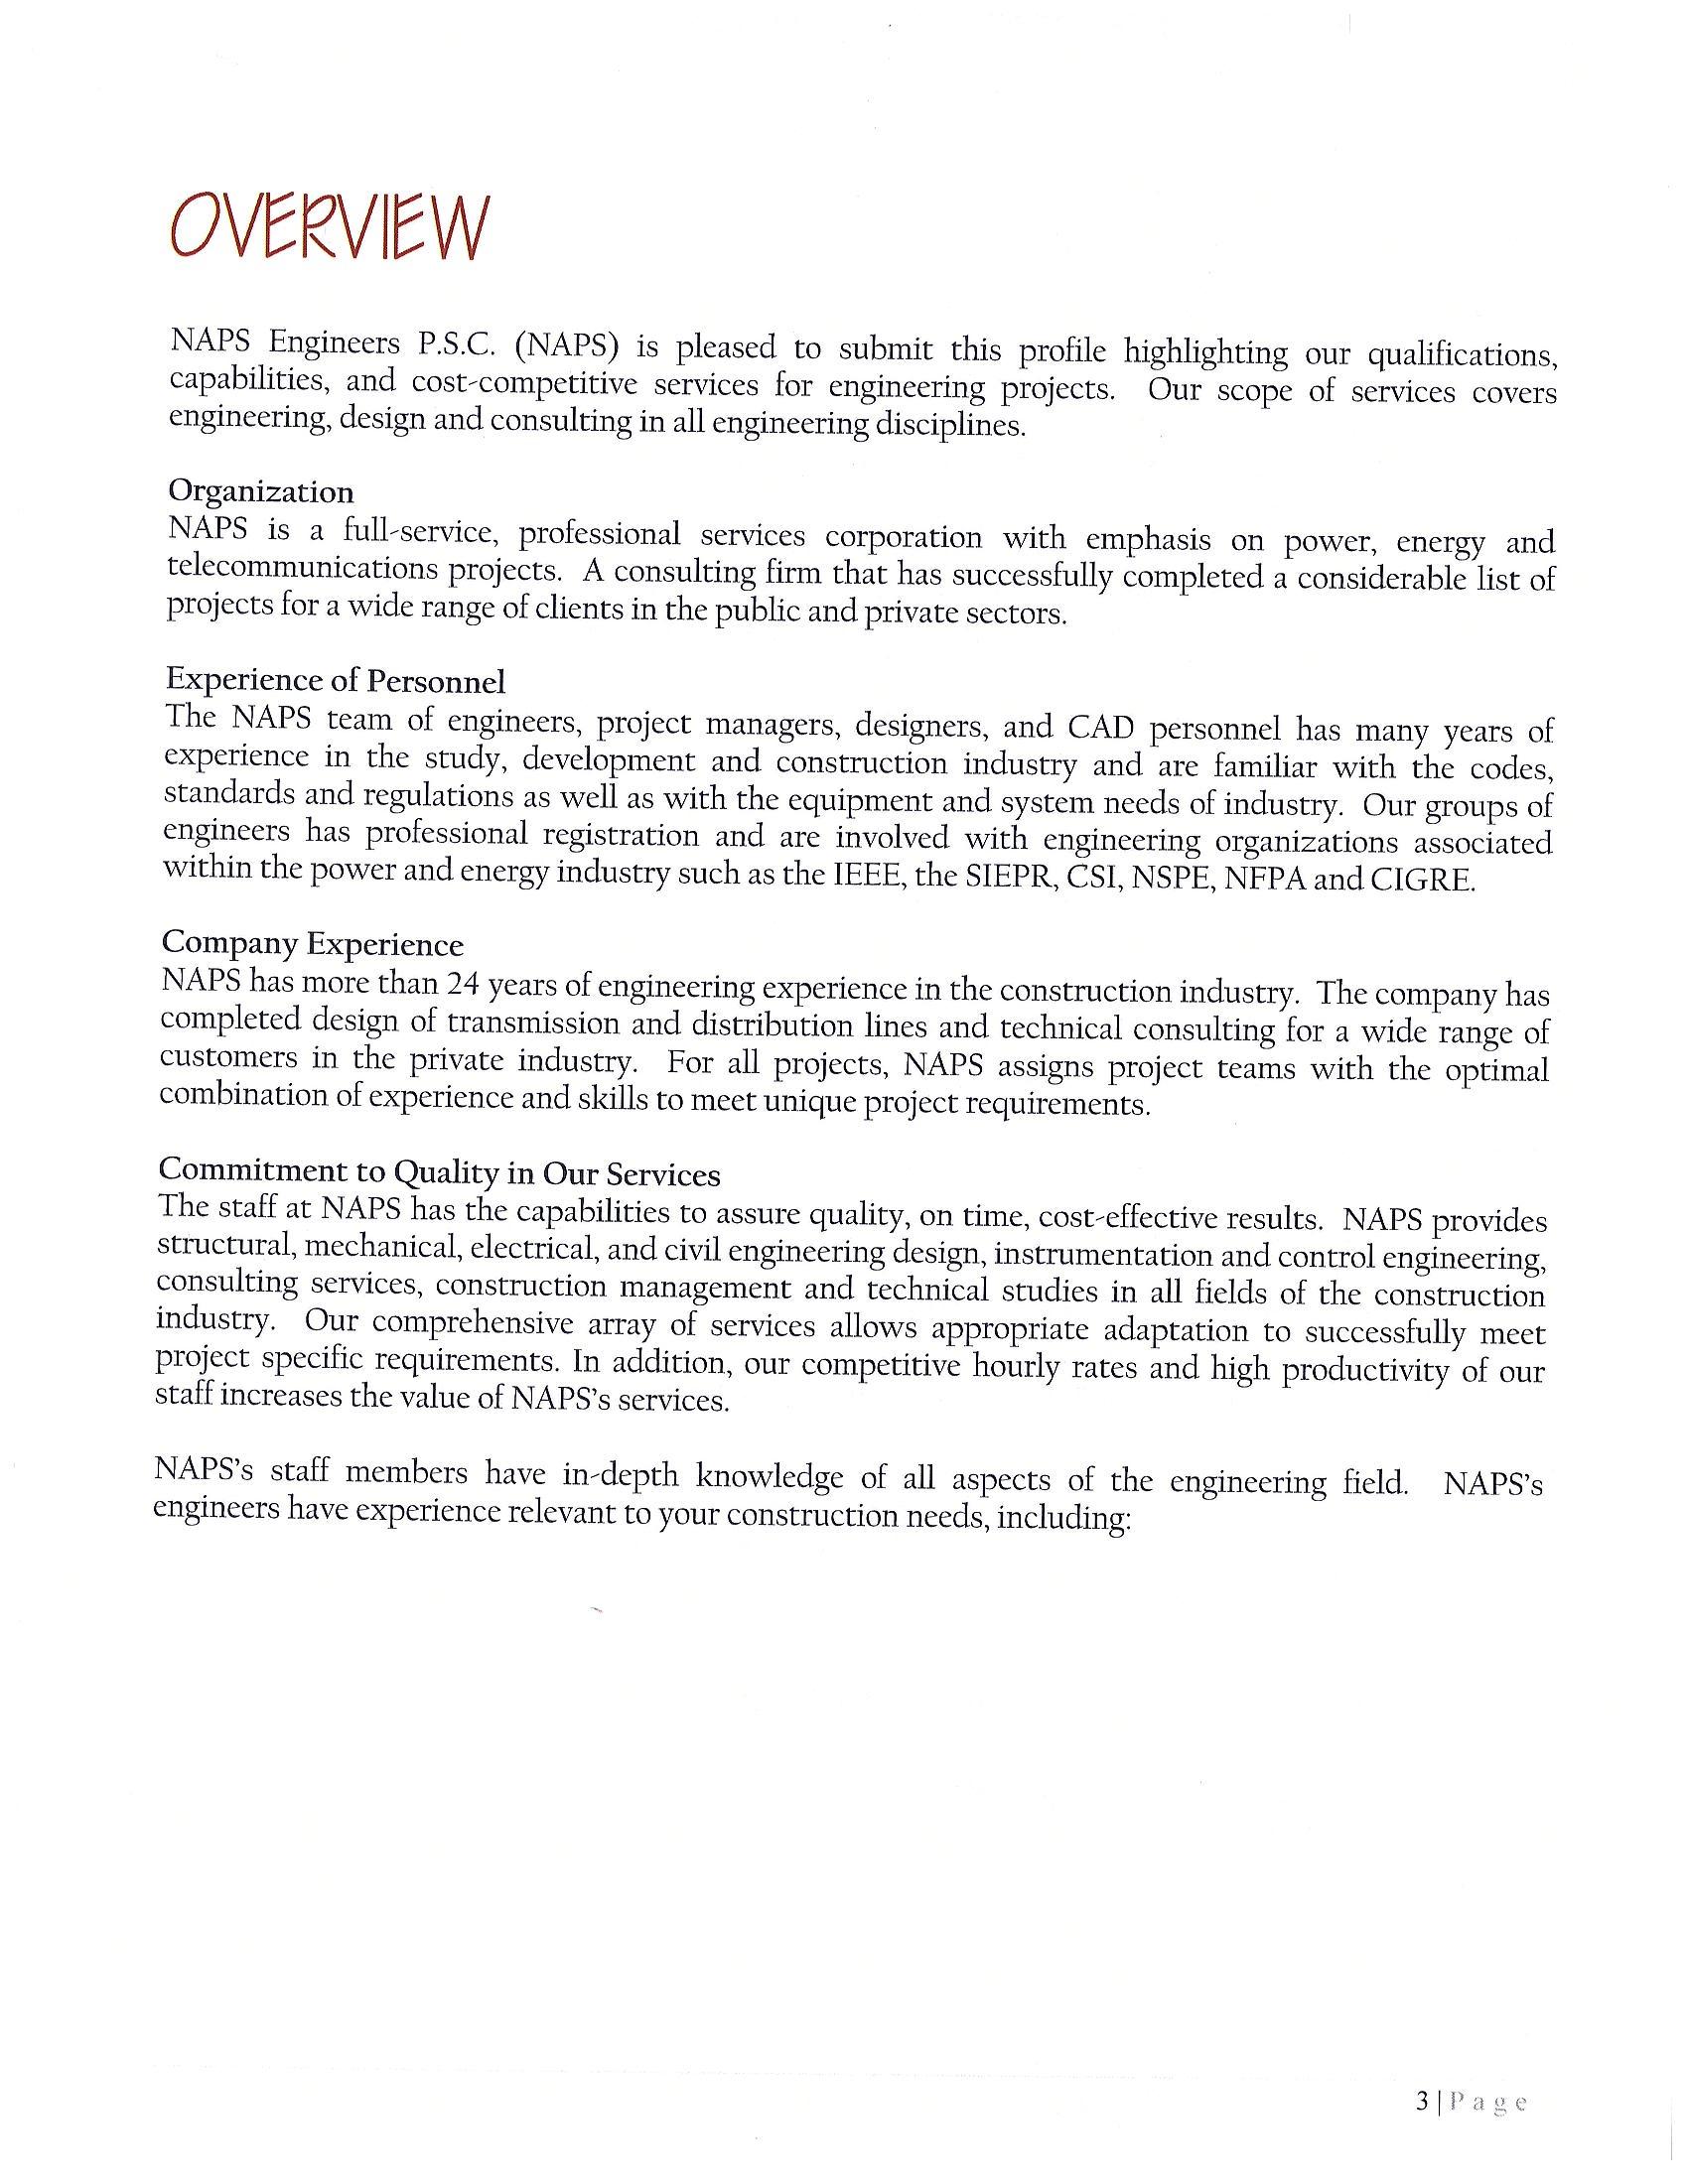 Xerox Scan_12272017173601_Page_1.jpg